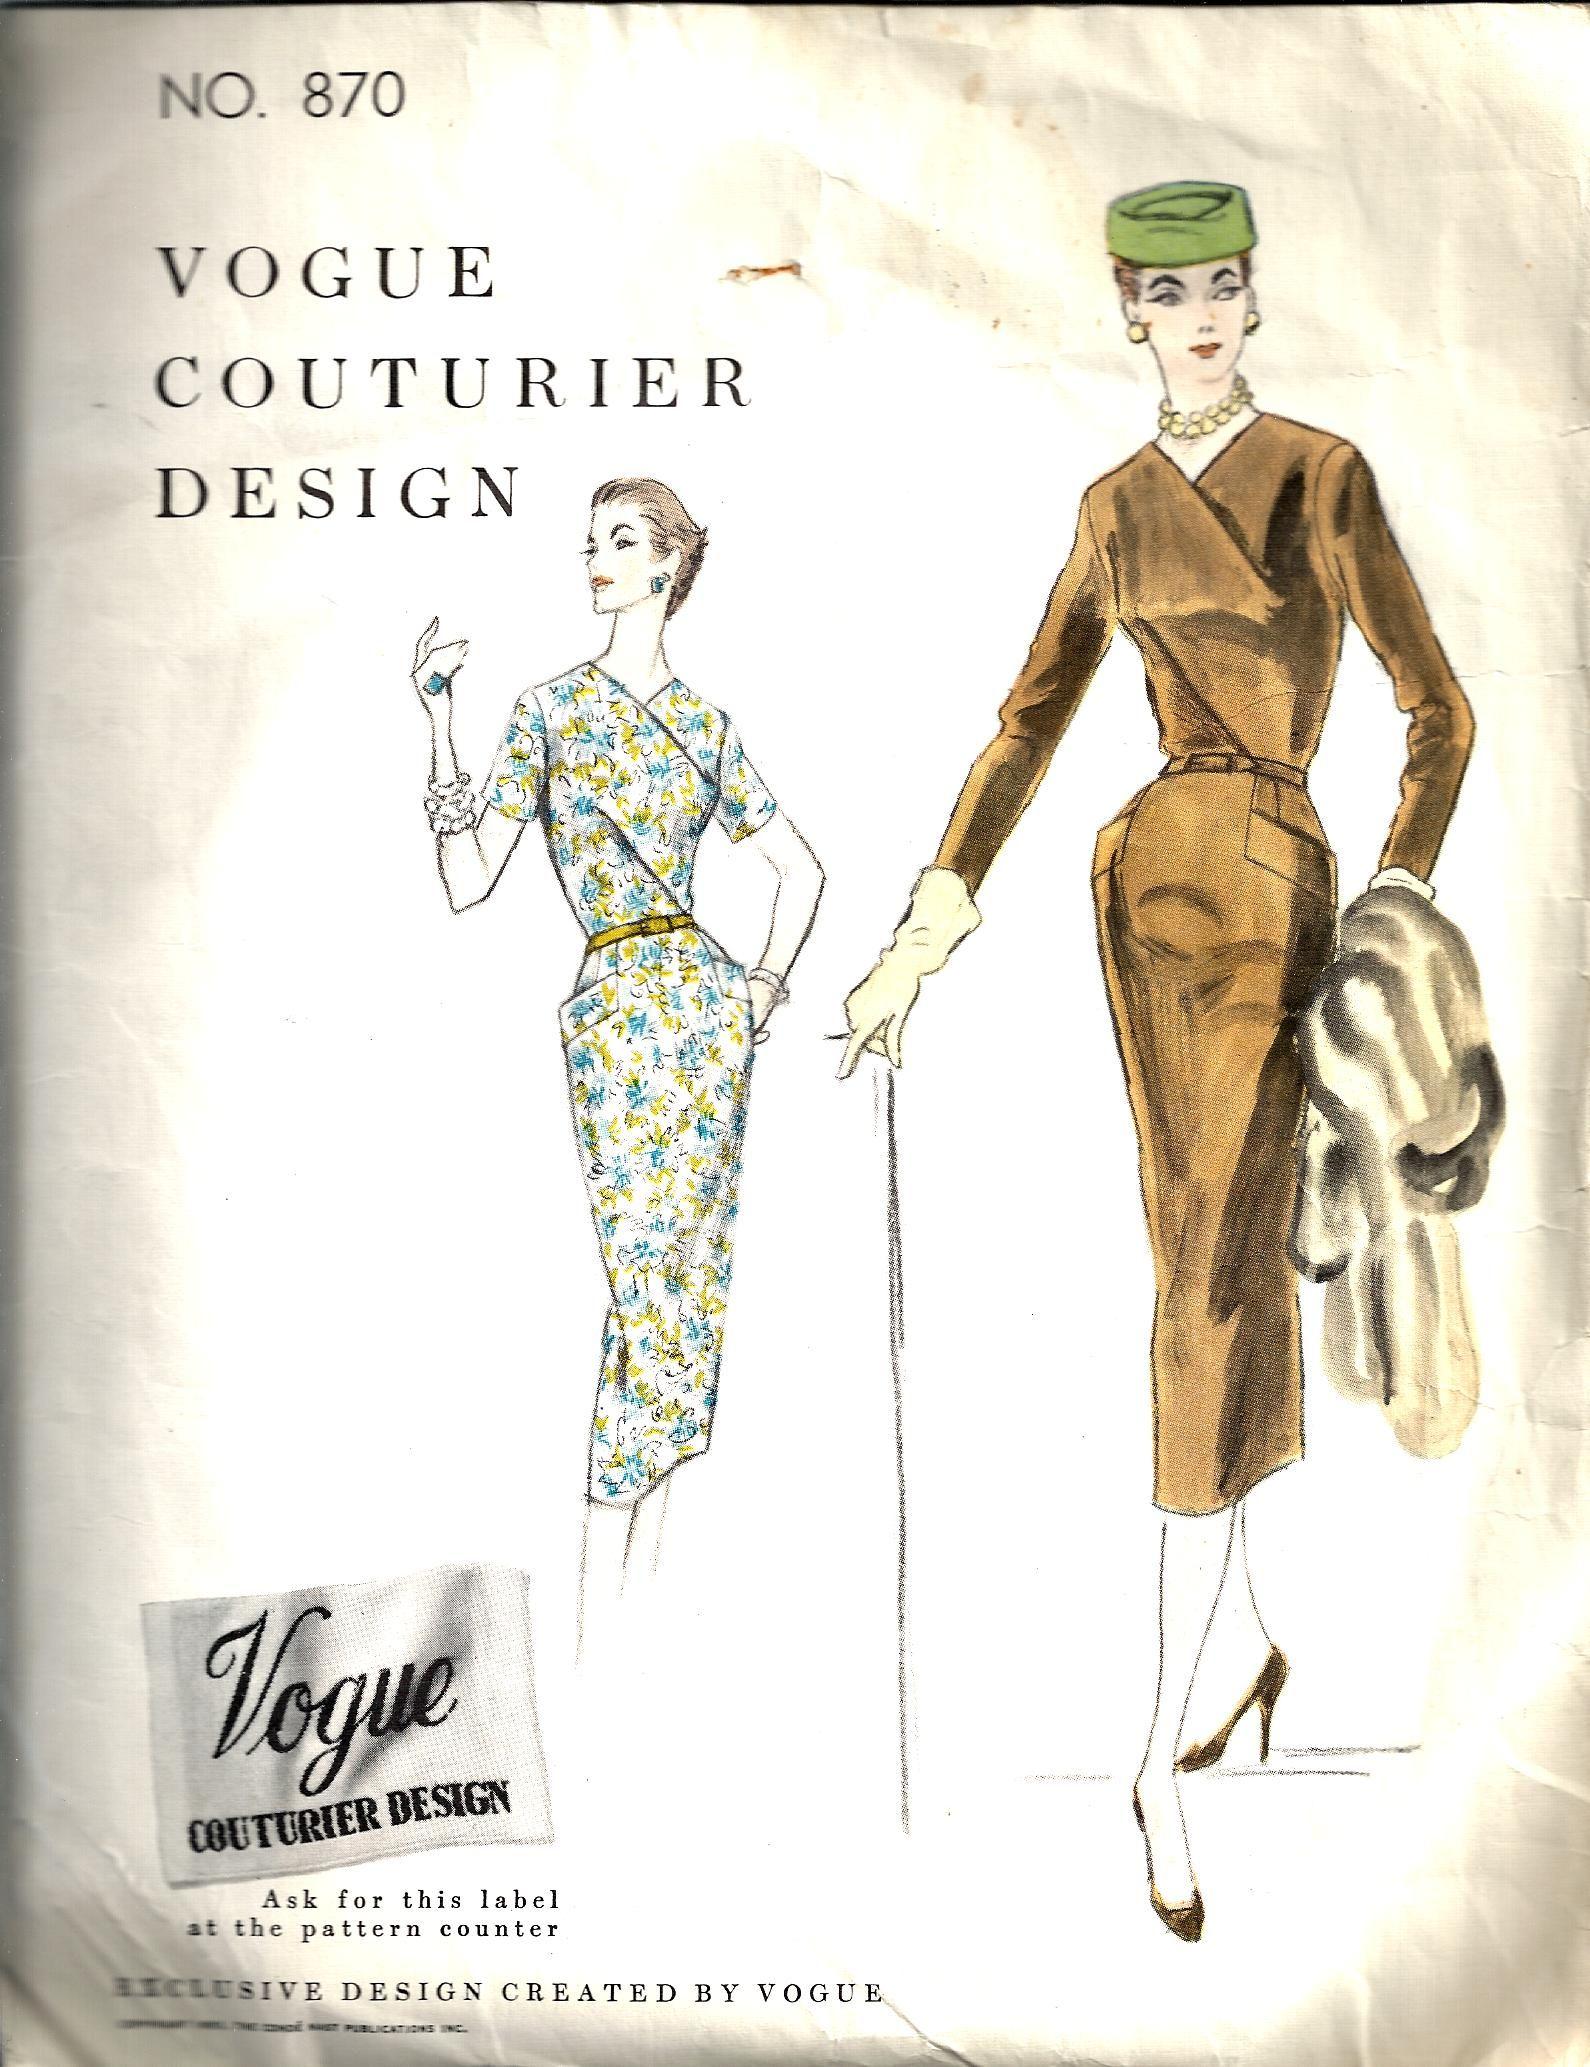 Vintage Sewing Pattern Dress Vogue Couturier 870 | paper, printables ...